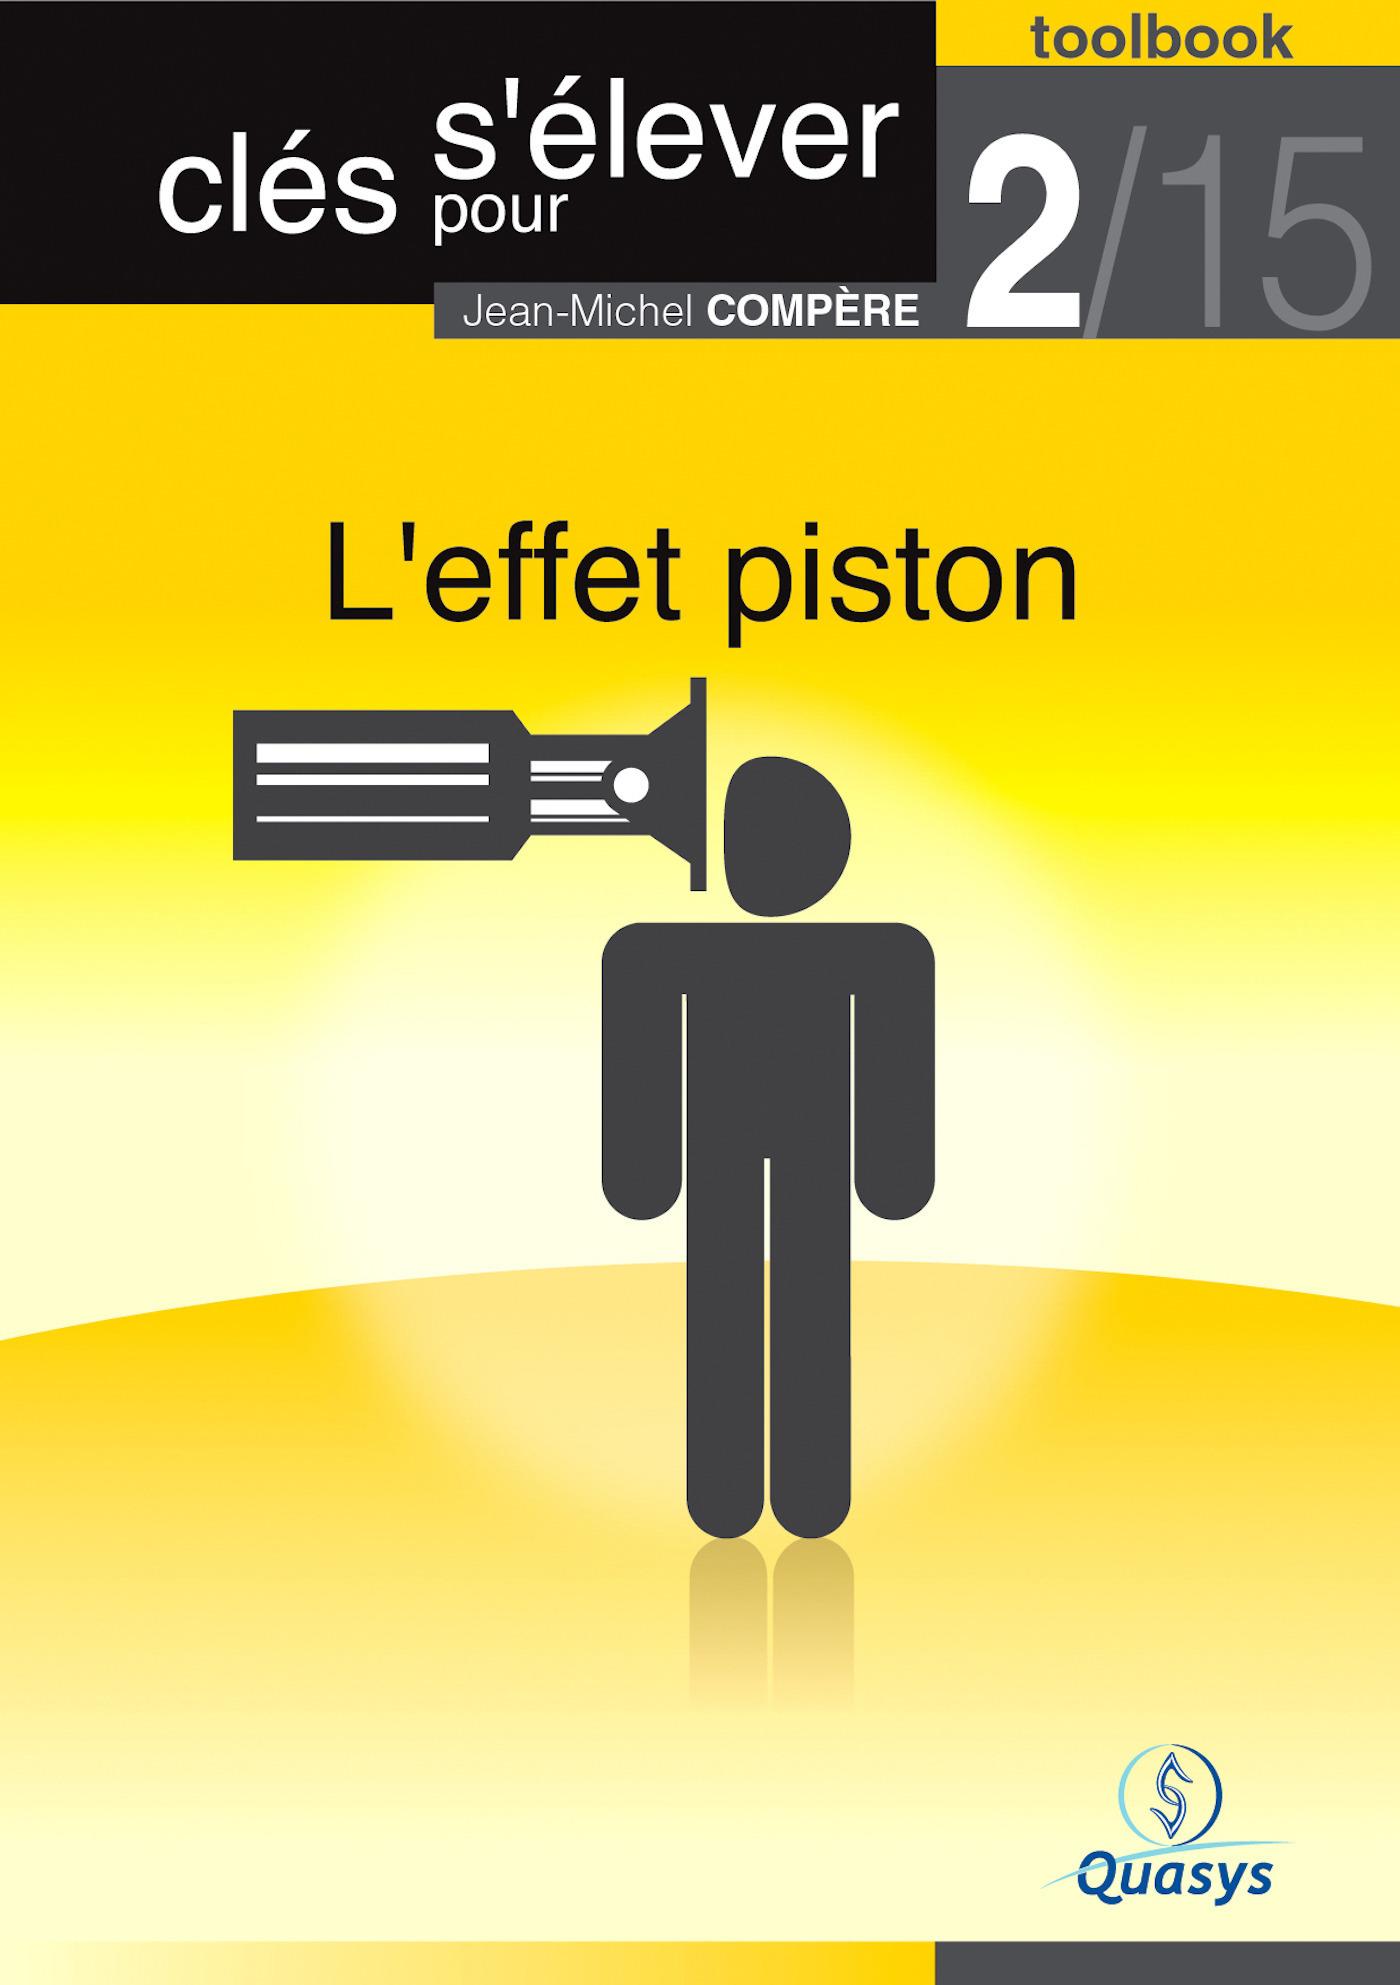 L'effet piston (Toolbook 2/15